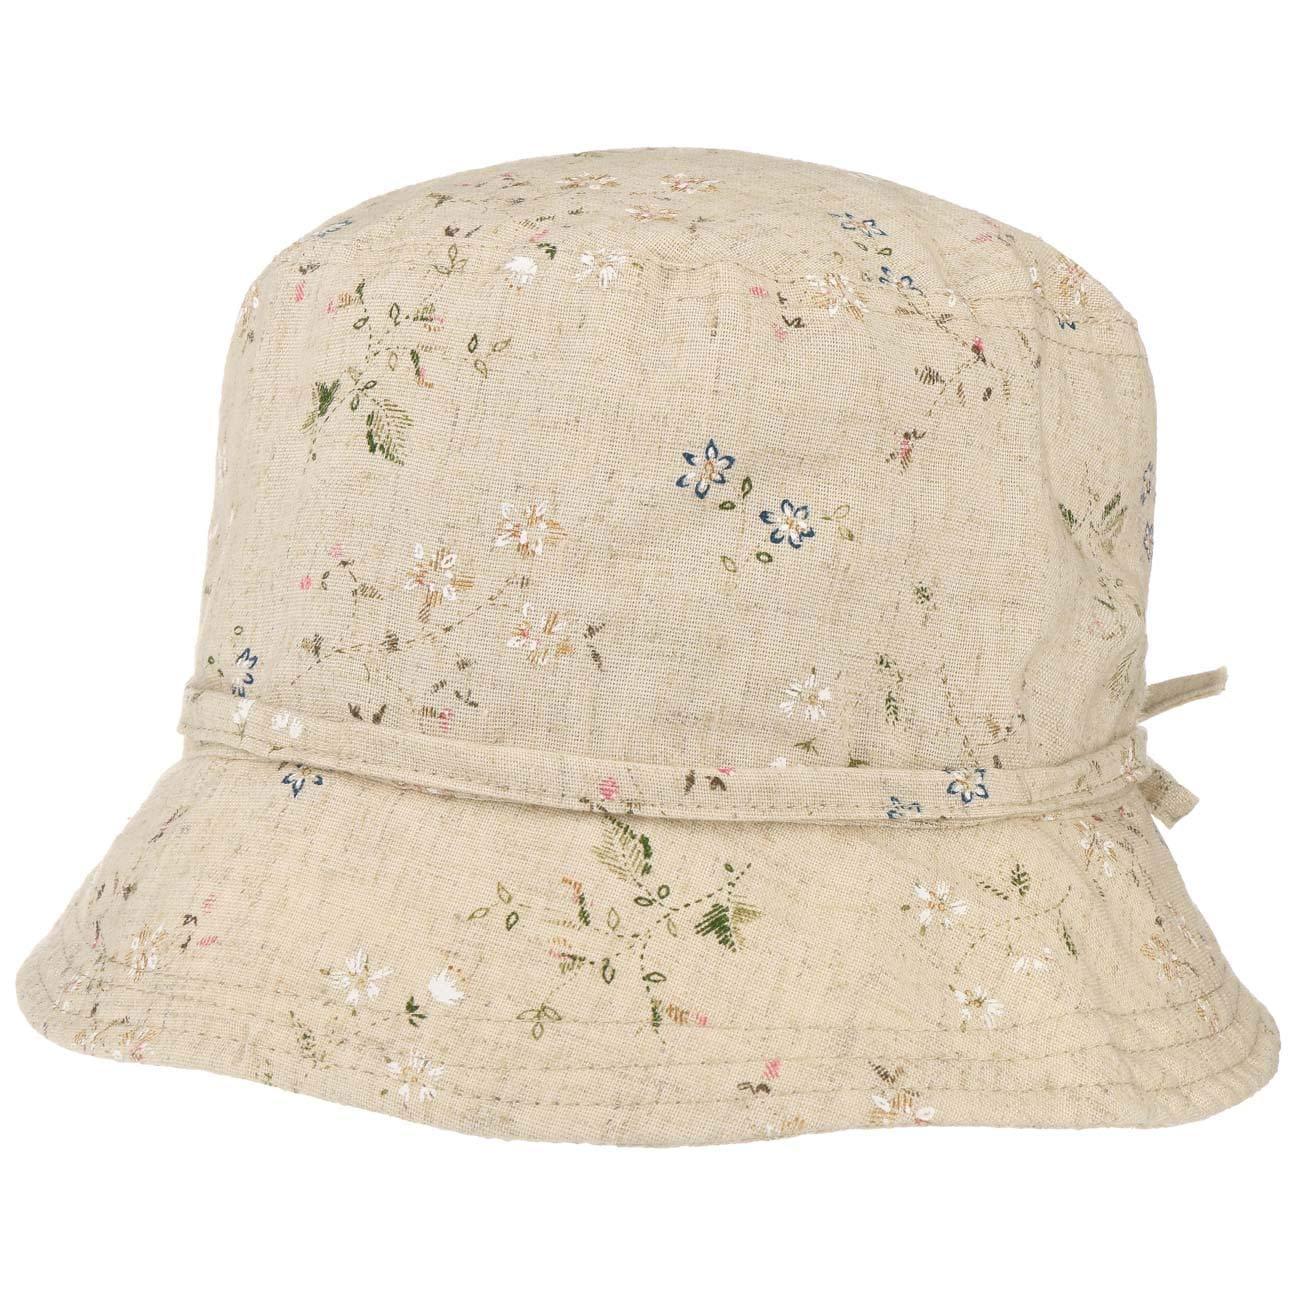 Lipodo Sombrero de Piel Artificial trilbysombrero Tela Trilby